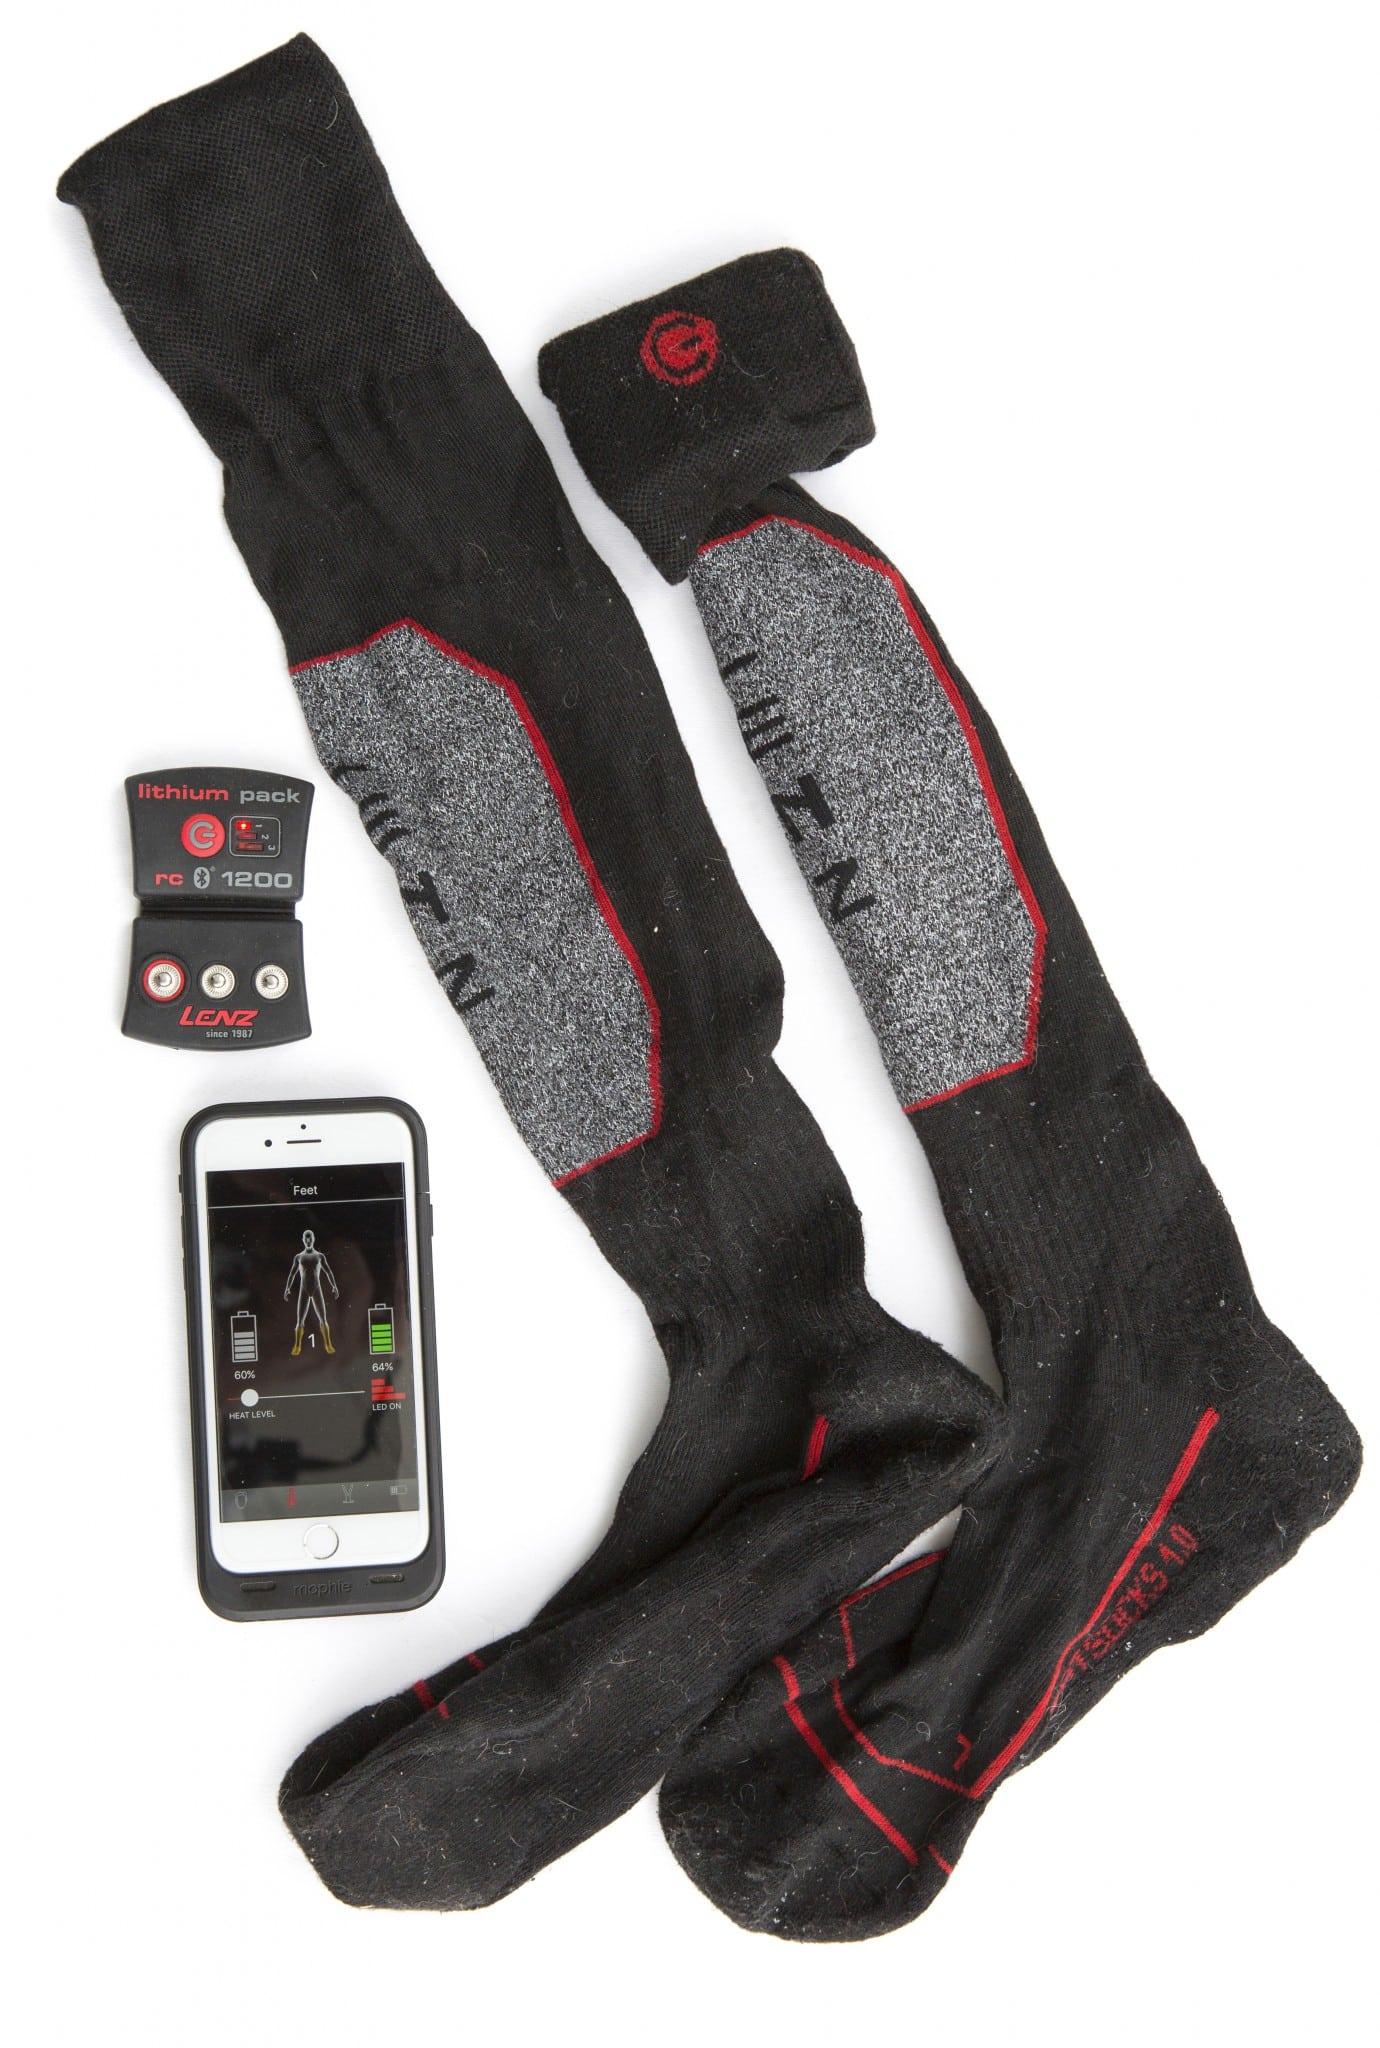 Lenz Heat Sock 1.0 + Lithium Pack.